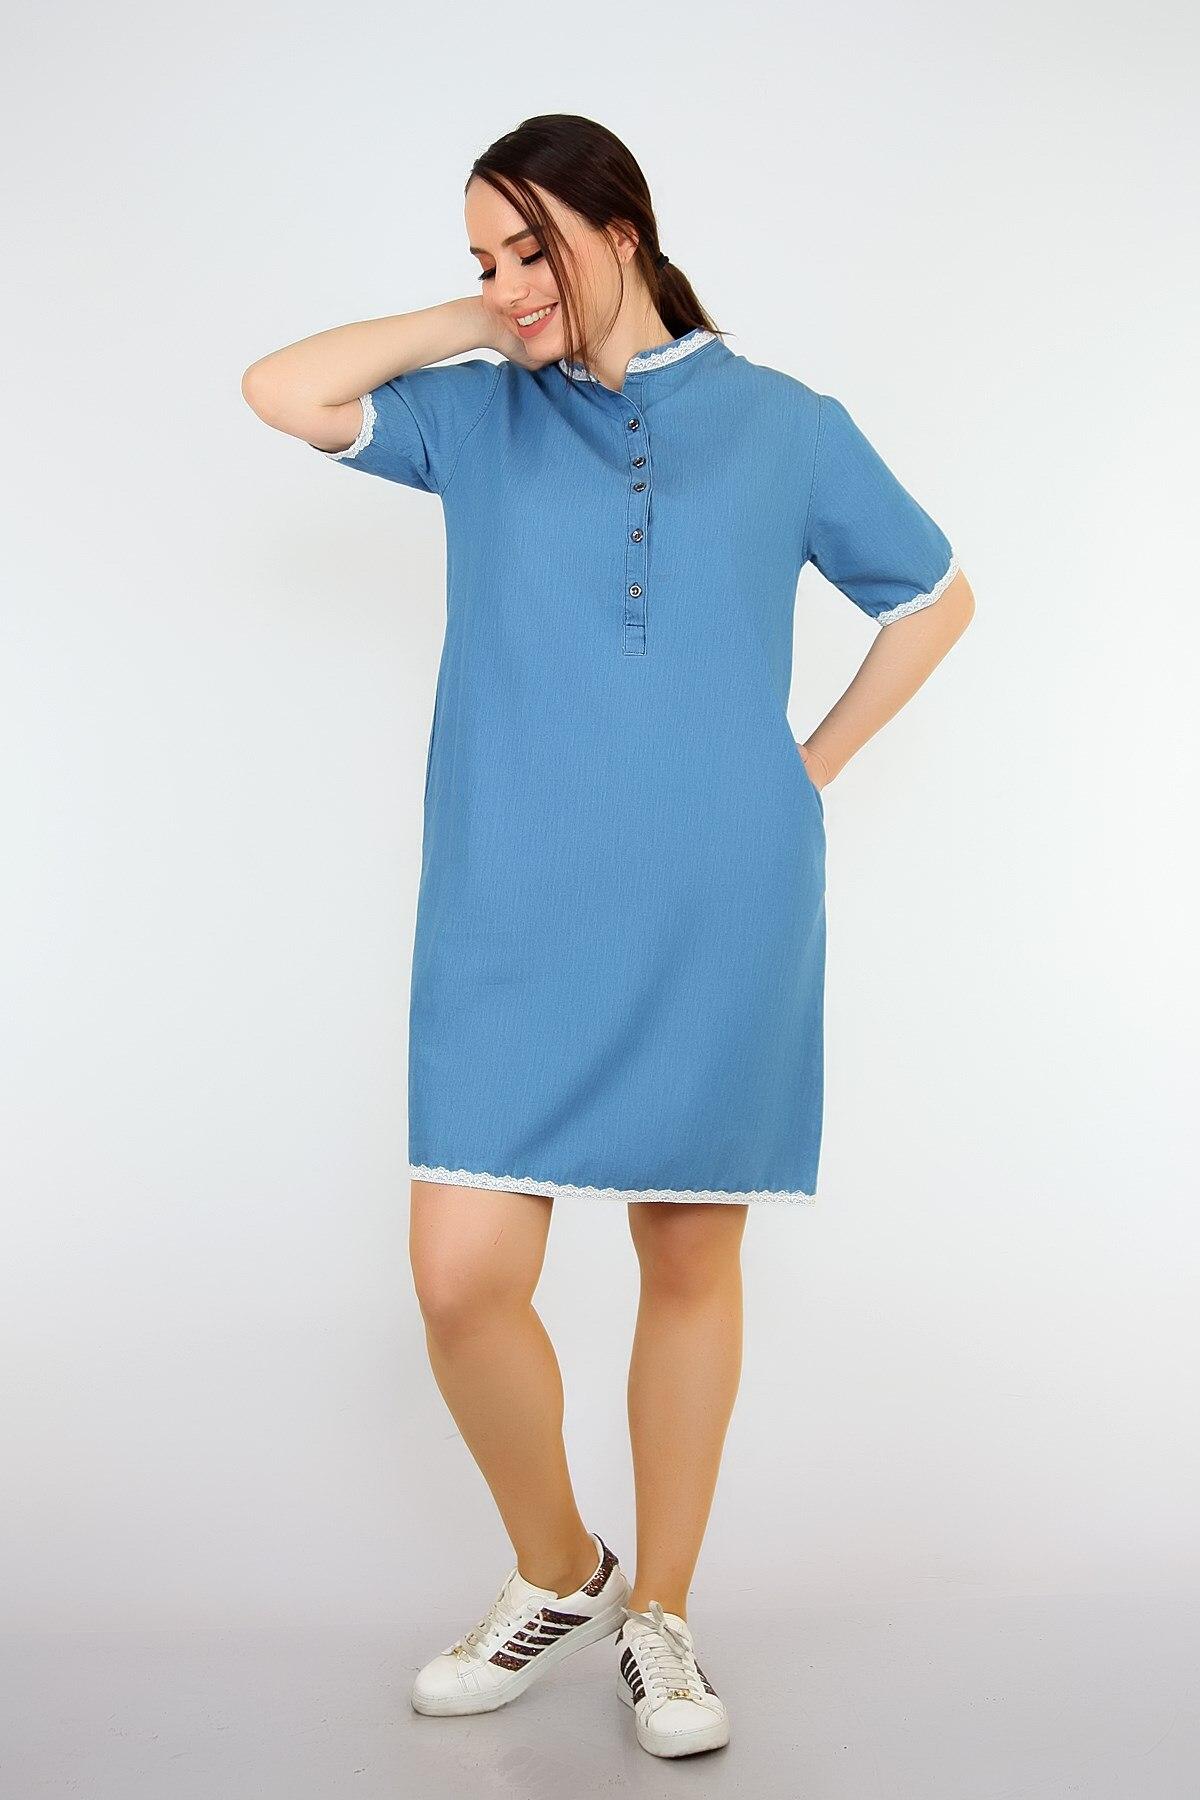 Pianoluce Women 'S Denim Lace Detail Half Sleeve Dress Blue 1387 3